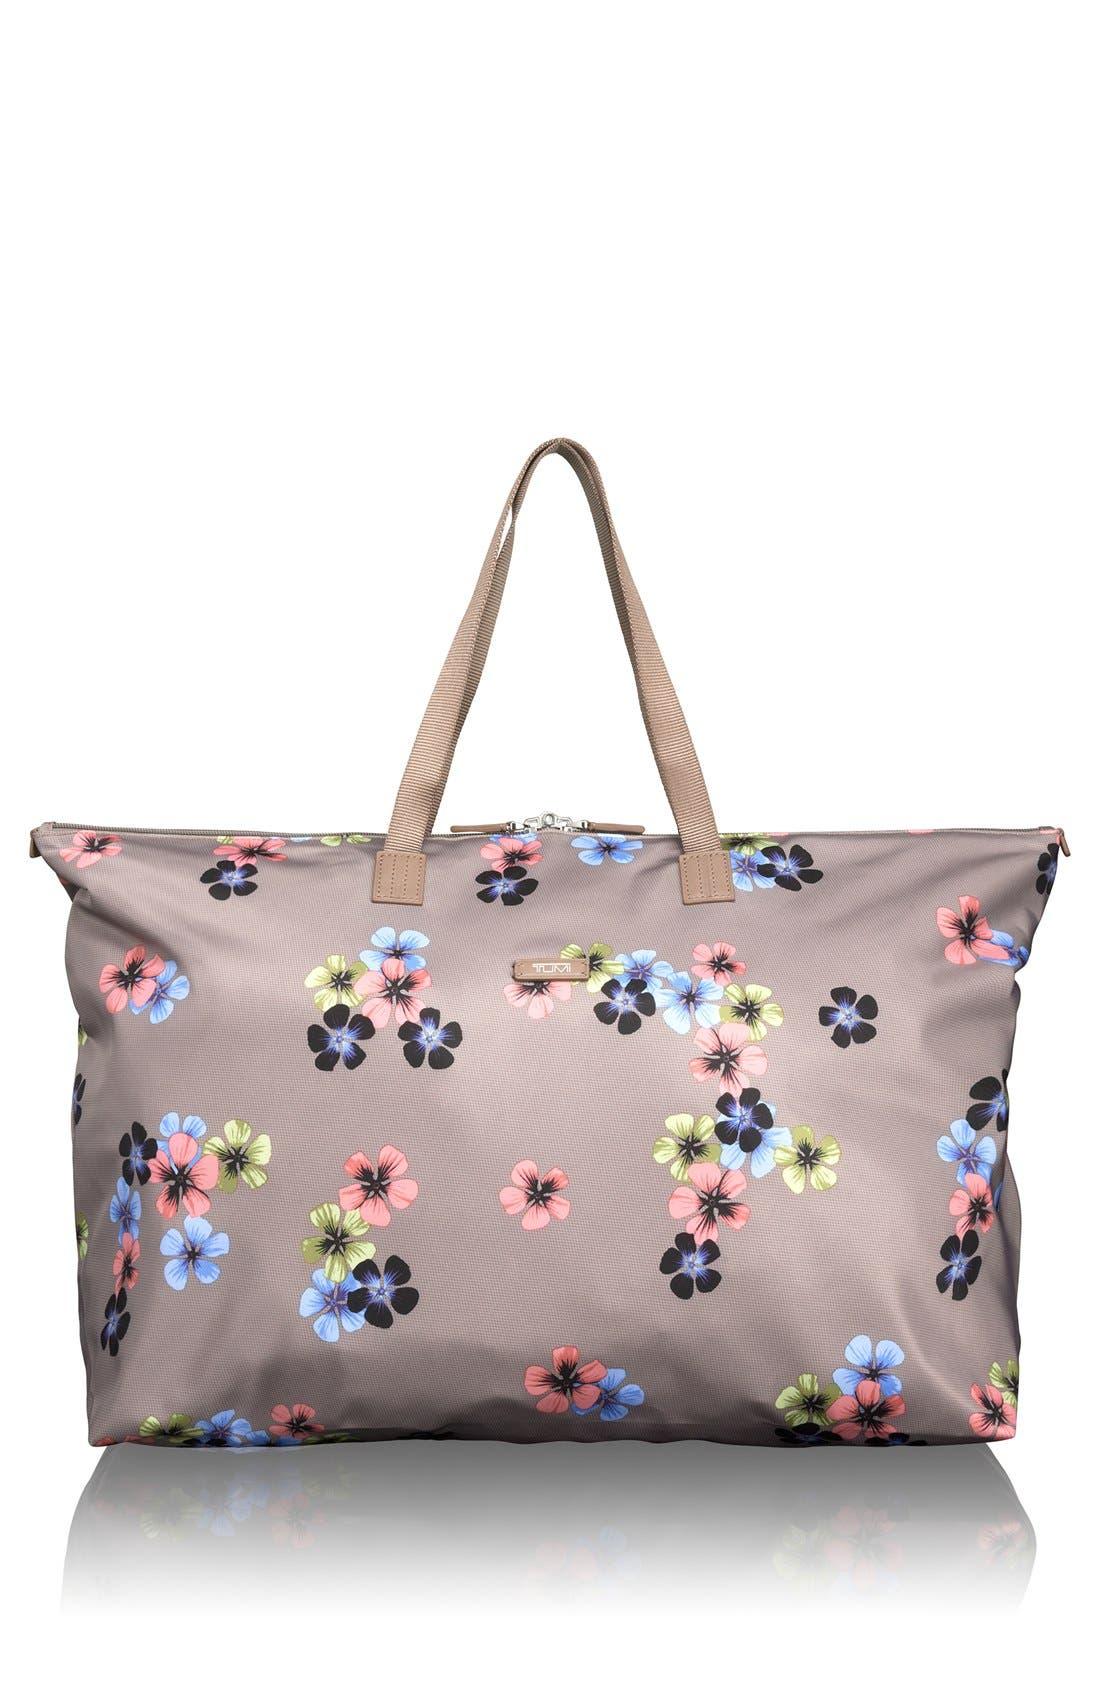 'Just In Case' Packable Duffel Bag,                             Main thumbnail 1, color,                             250